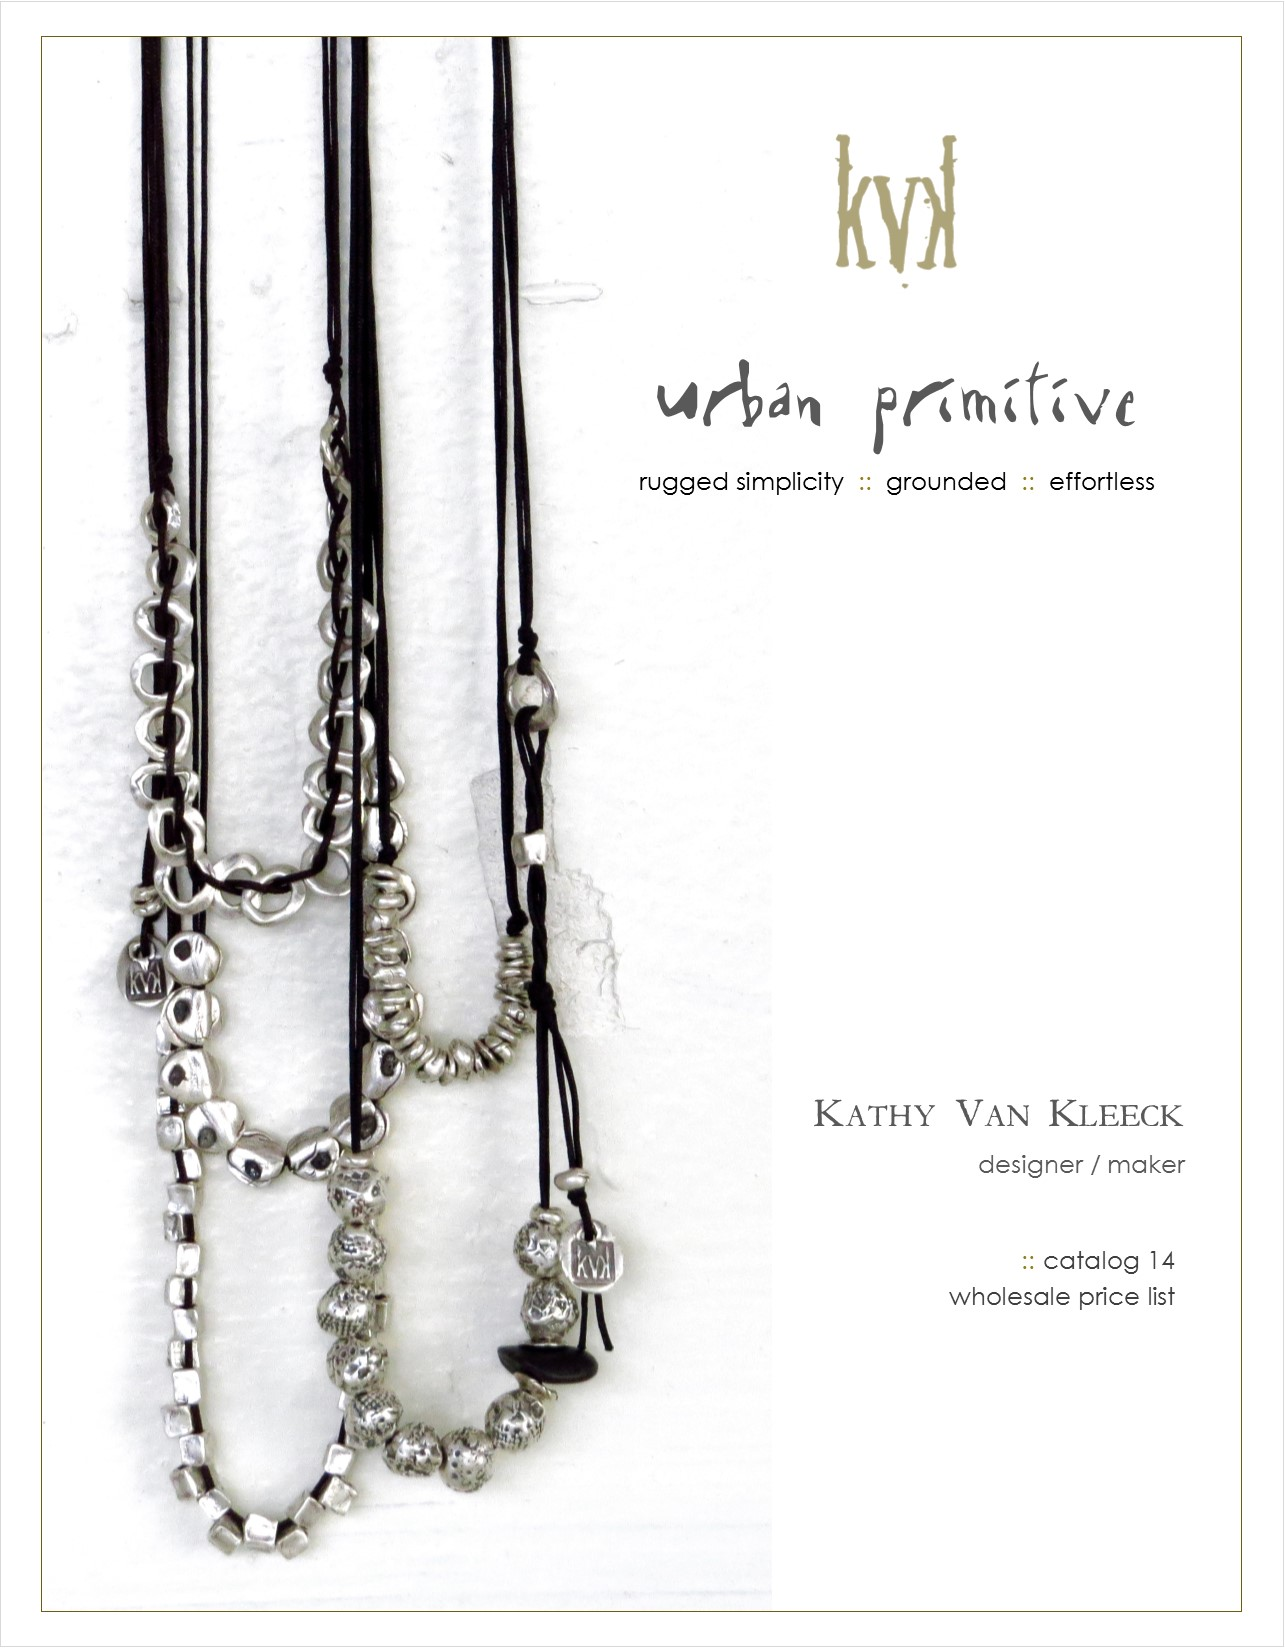 catalog 14 cover kathy van kleeck